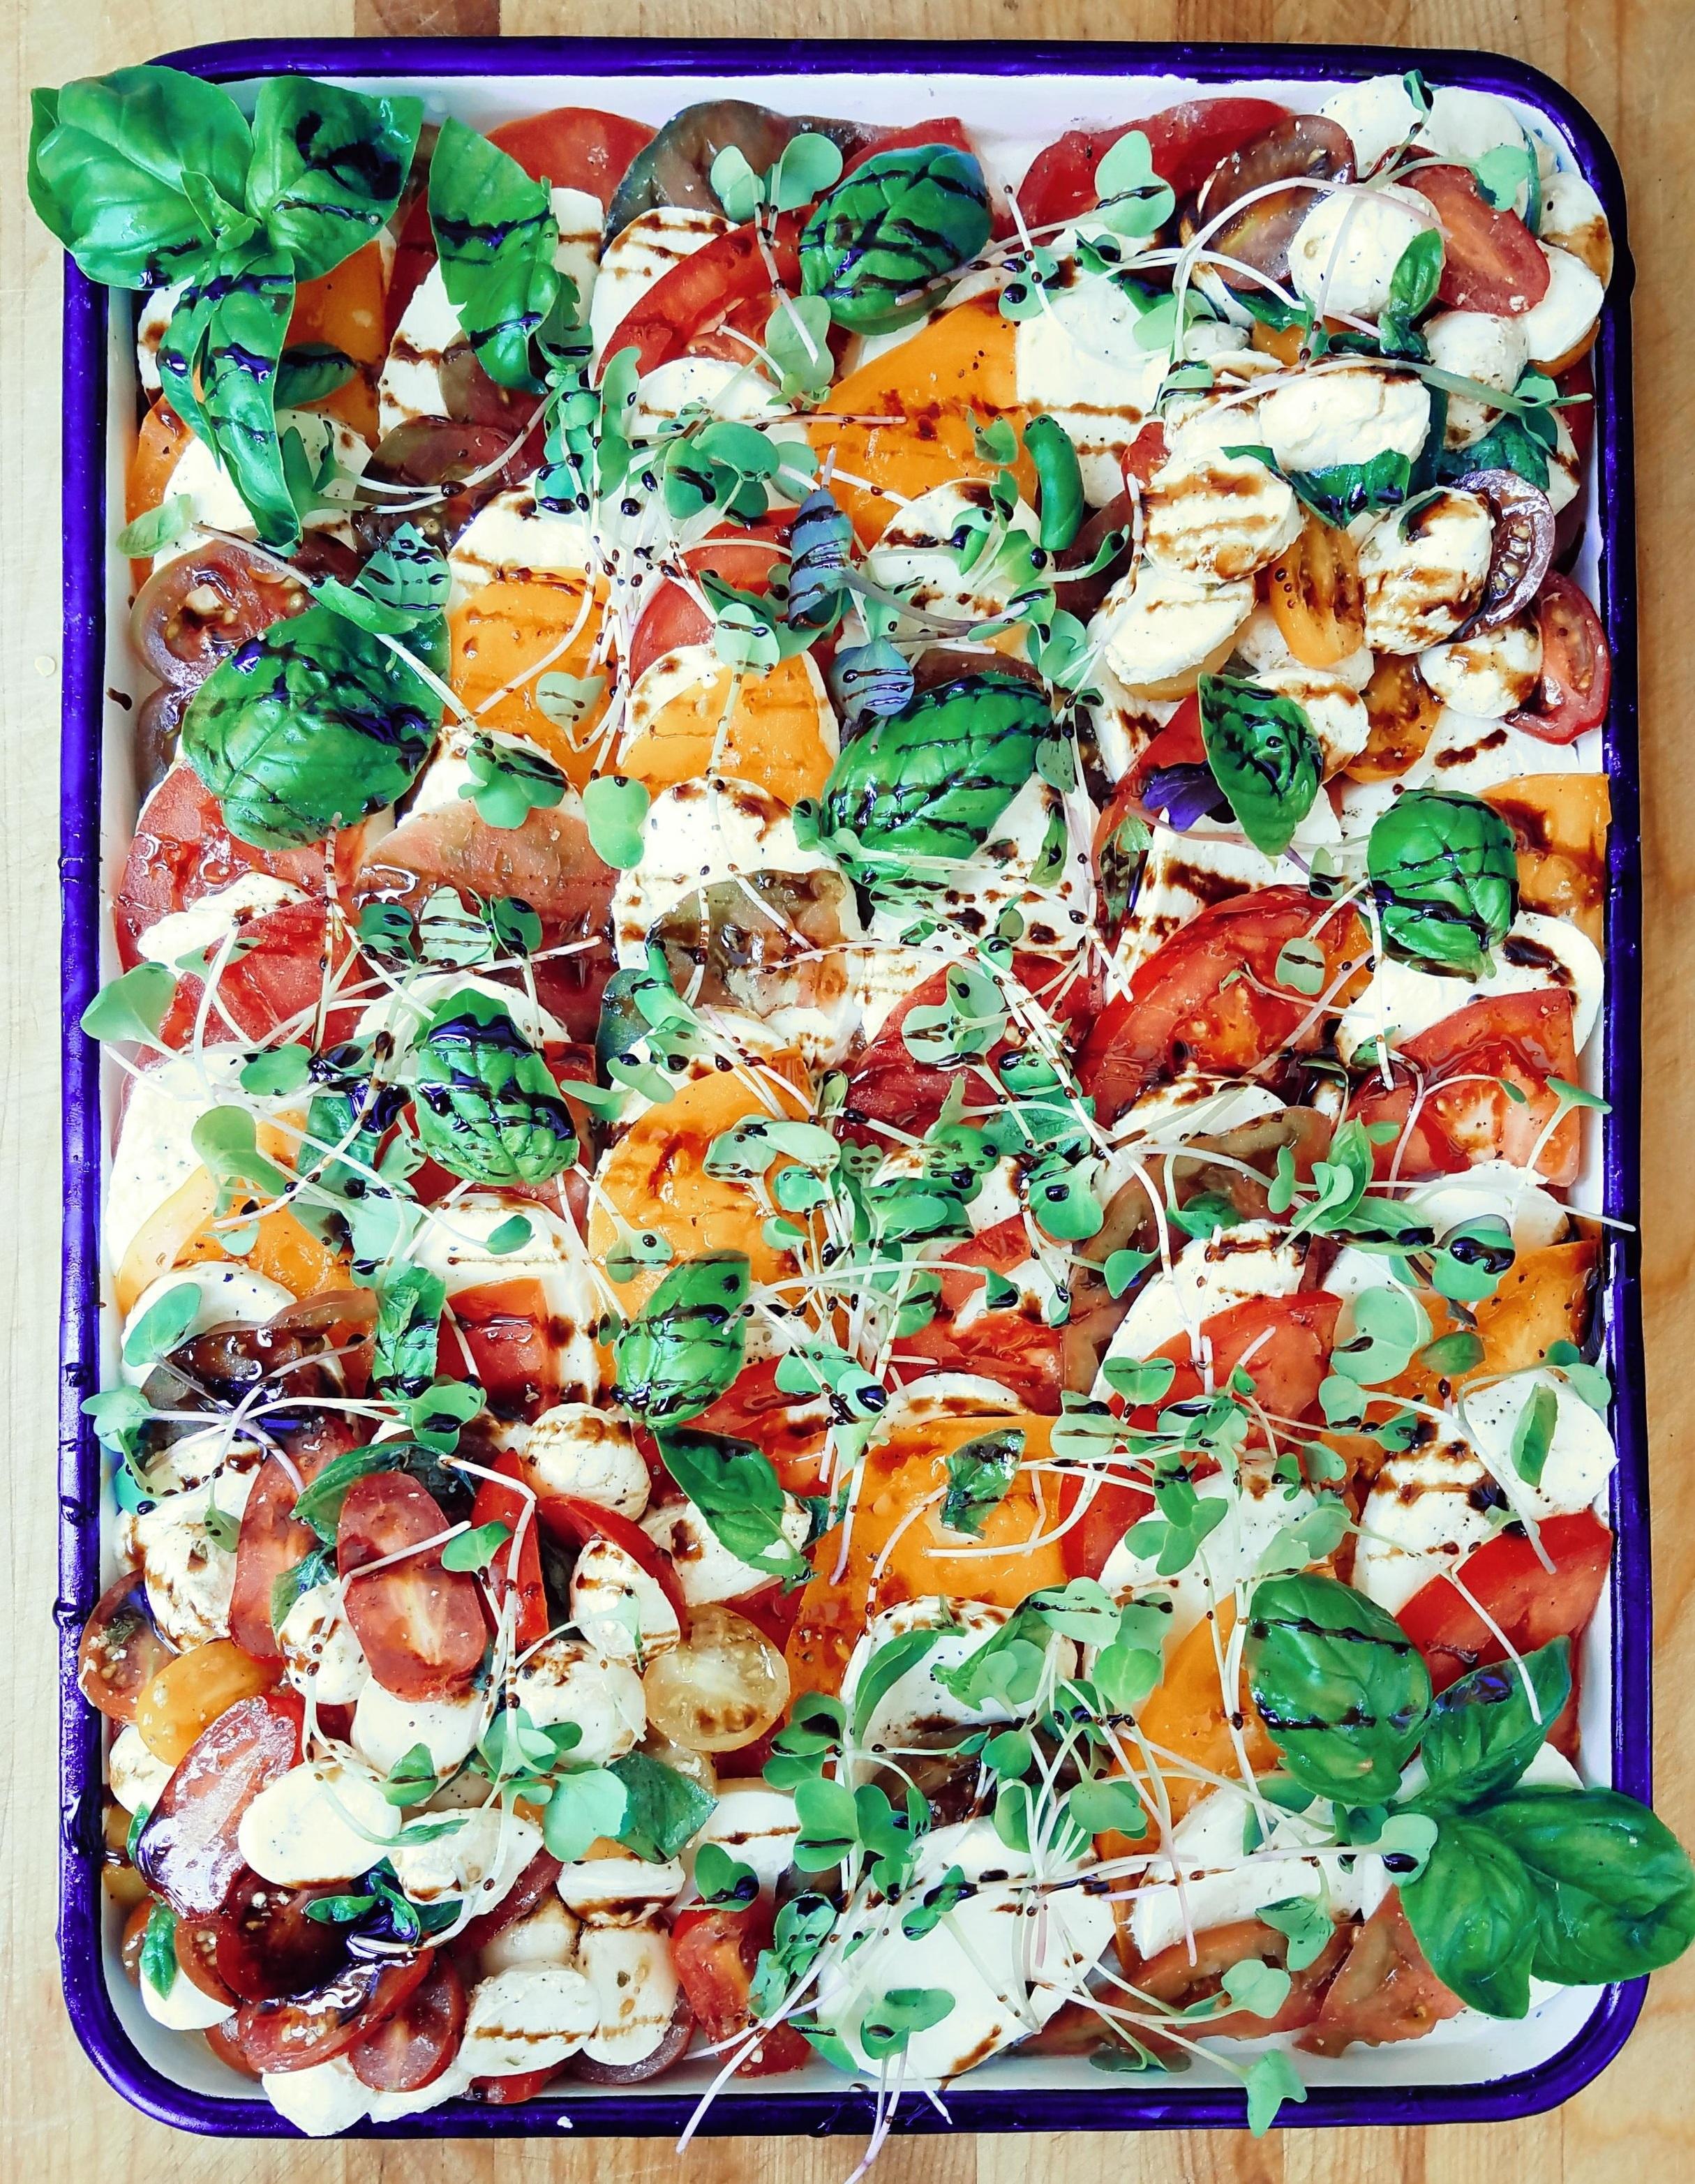 Heirloom Tomato + Mozzarella.    micro greens. basil. xvoo. balsamc reduction.